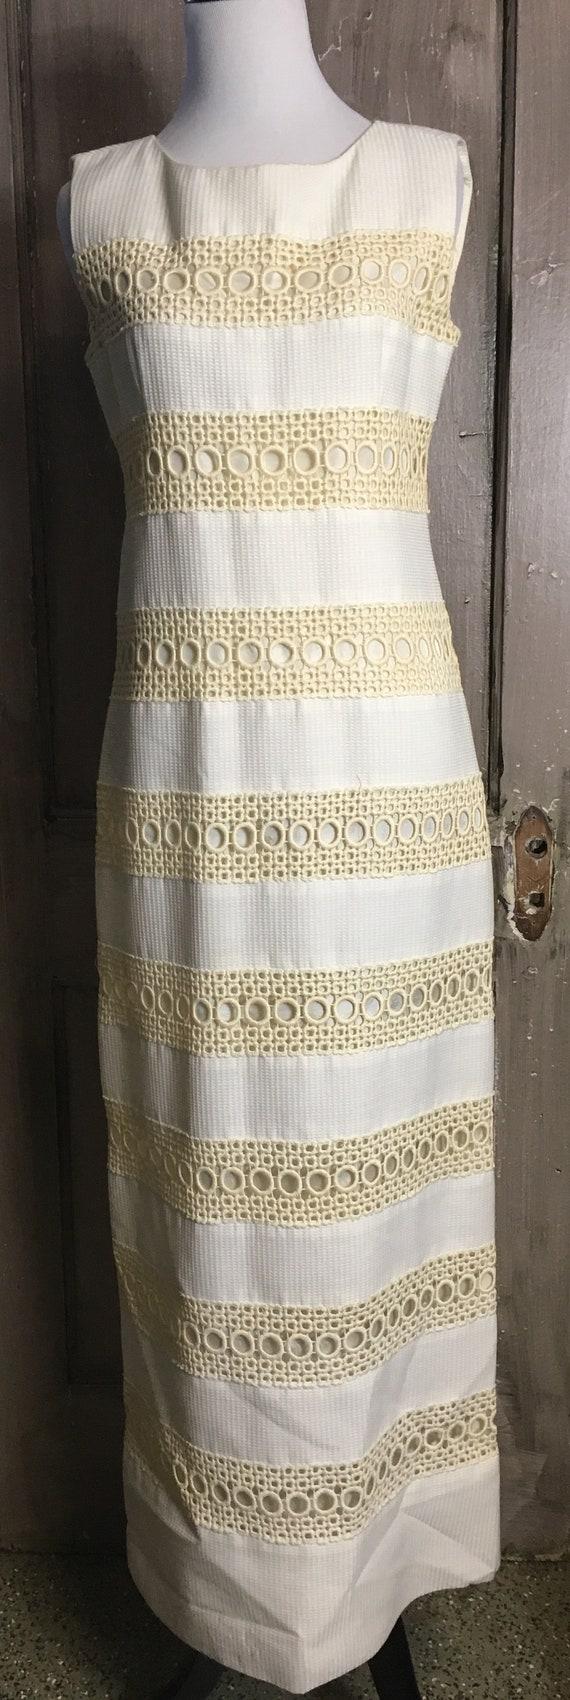 Vintage 70's Long Maxi Dress